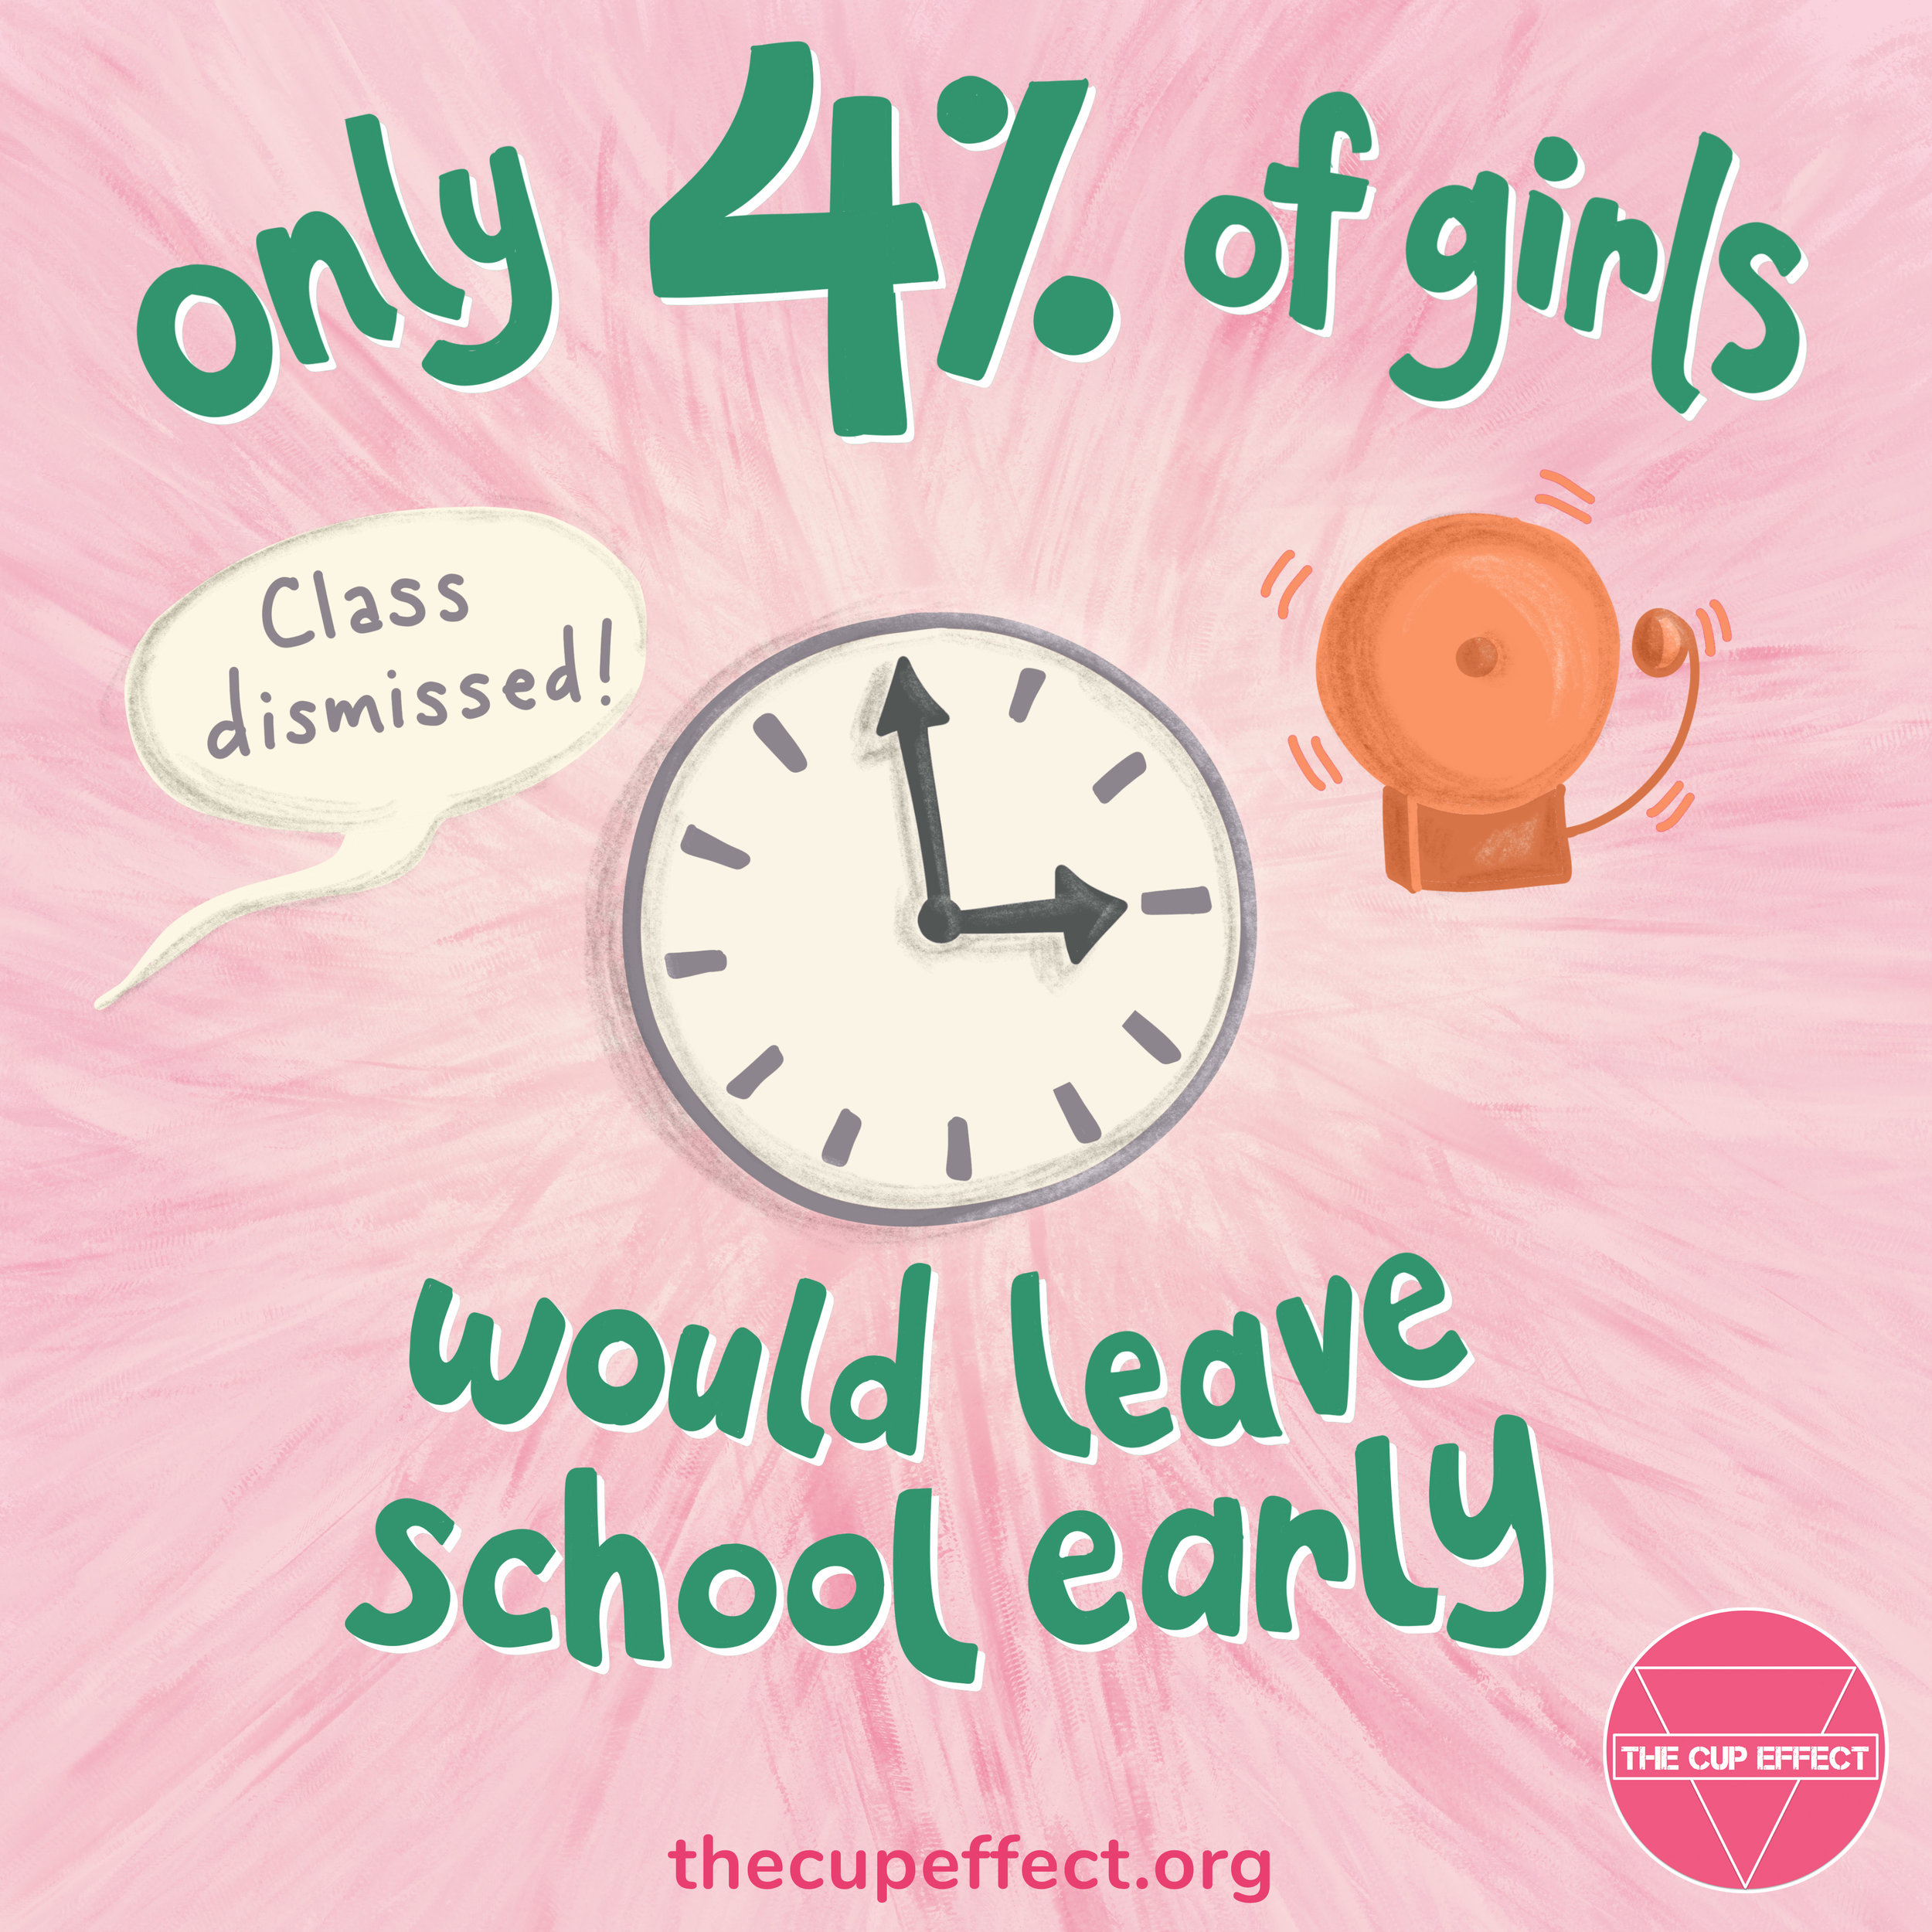 Leave_School_Early.jpg